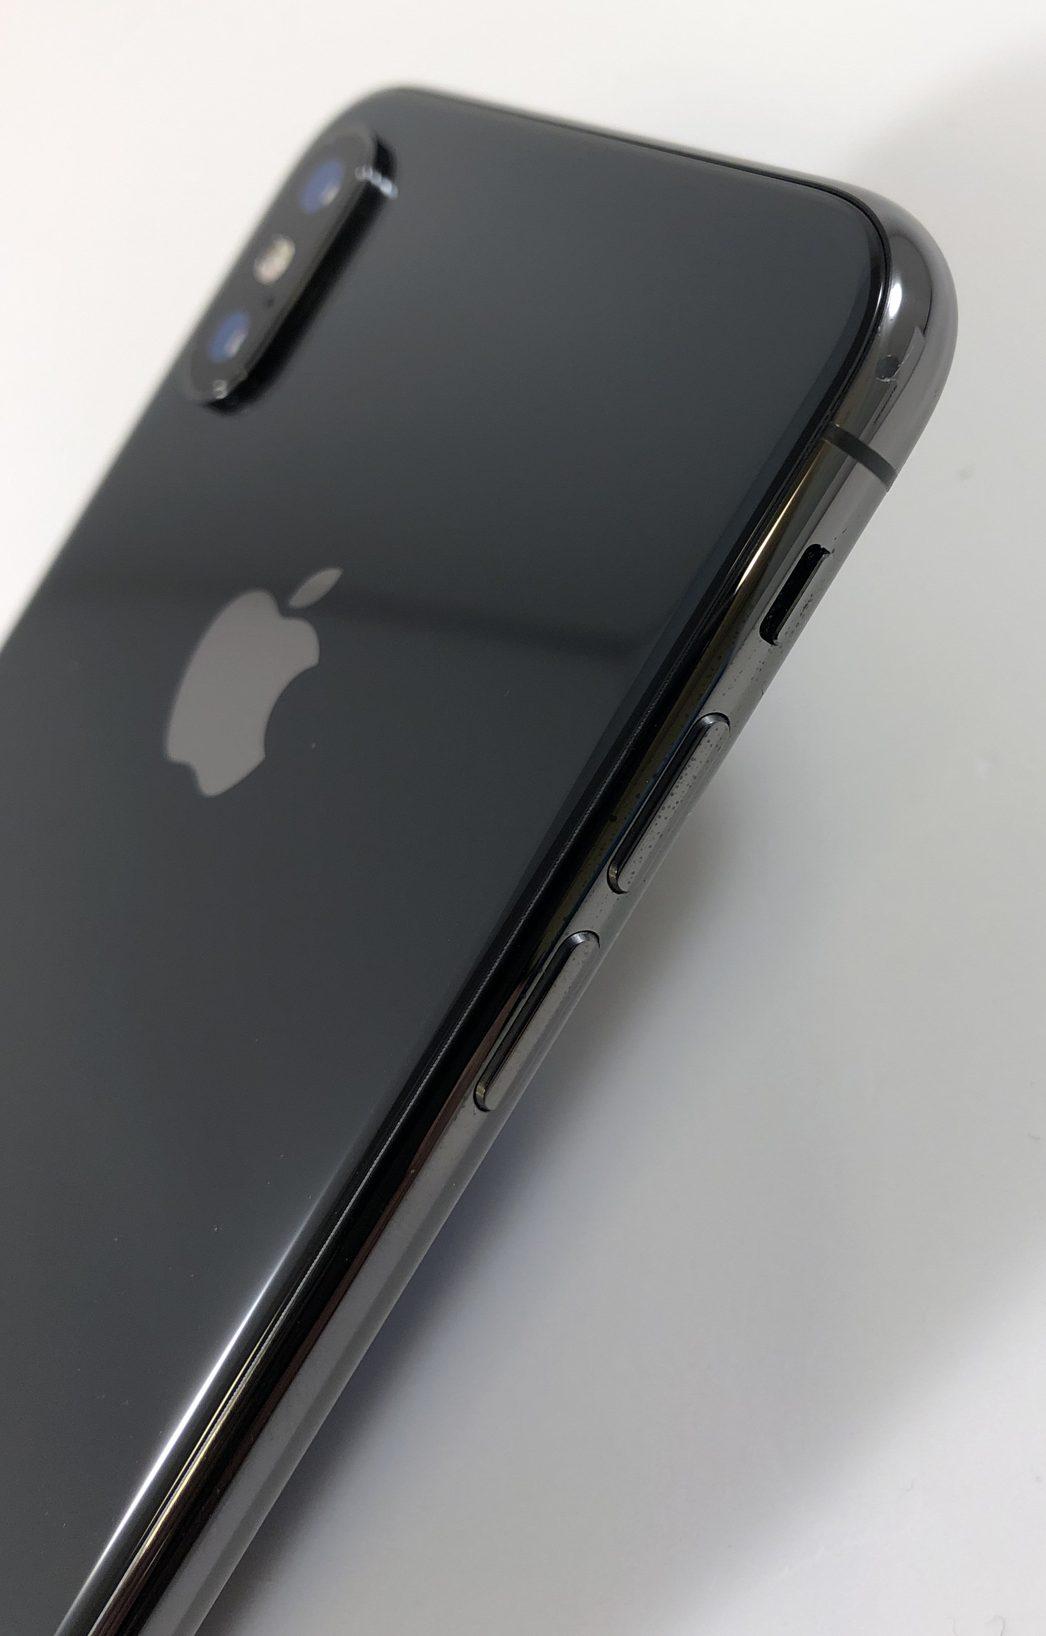 iPhone X 256GB, 256GB, Space Gray, bild 3